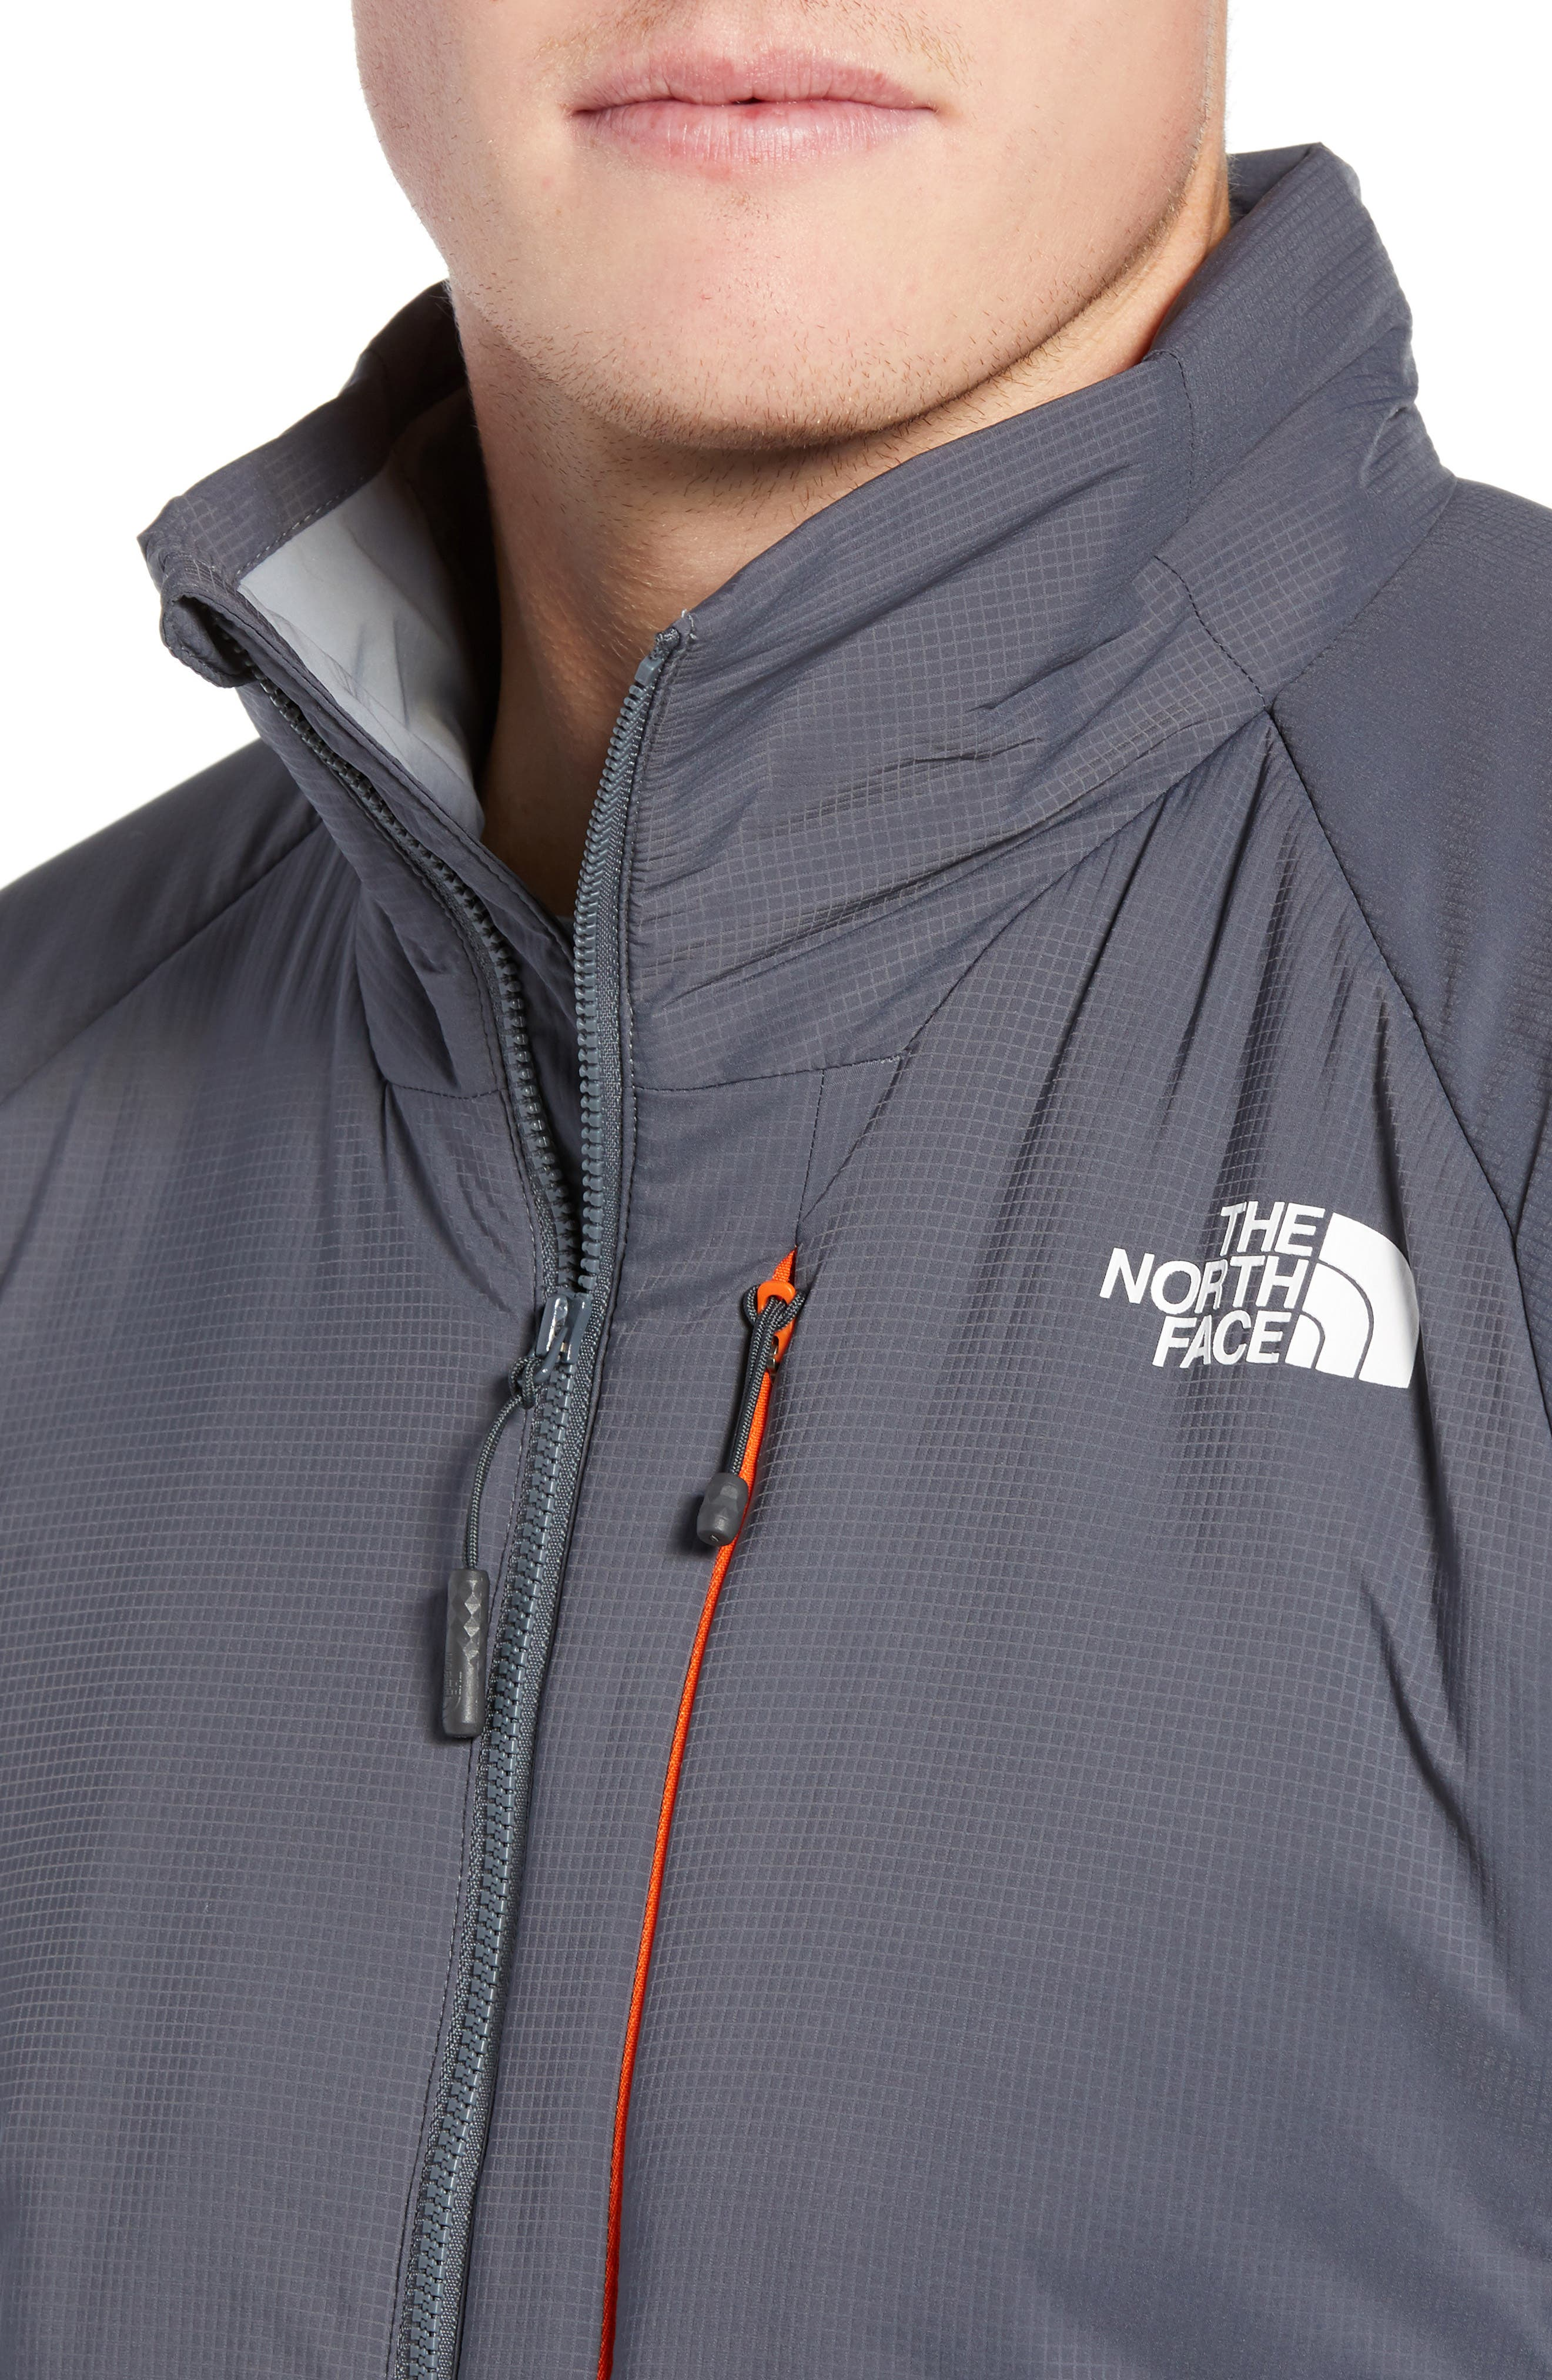 Ventrix Water Resistant Ripstop Jacket,                             Alternate thumbnail 4, color,                             VANADIS GREY/ VANADIS GREY